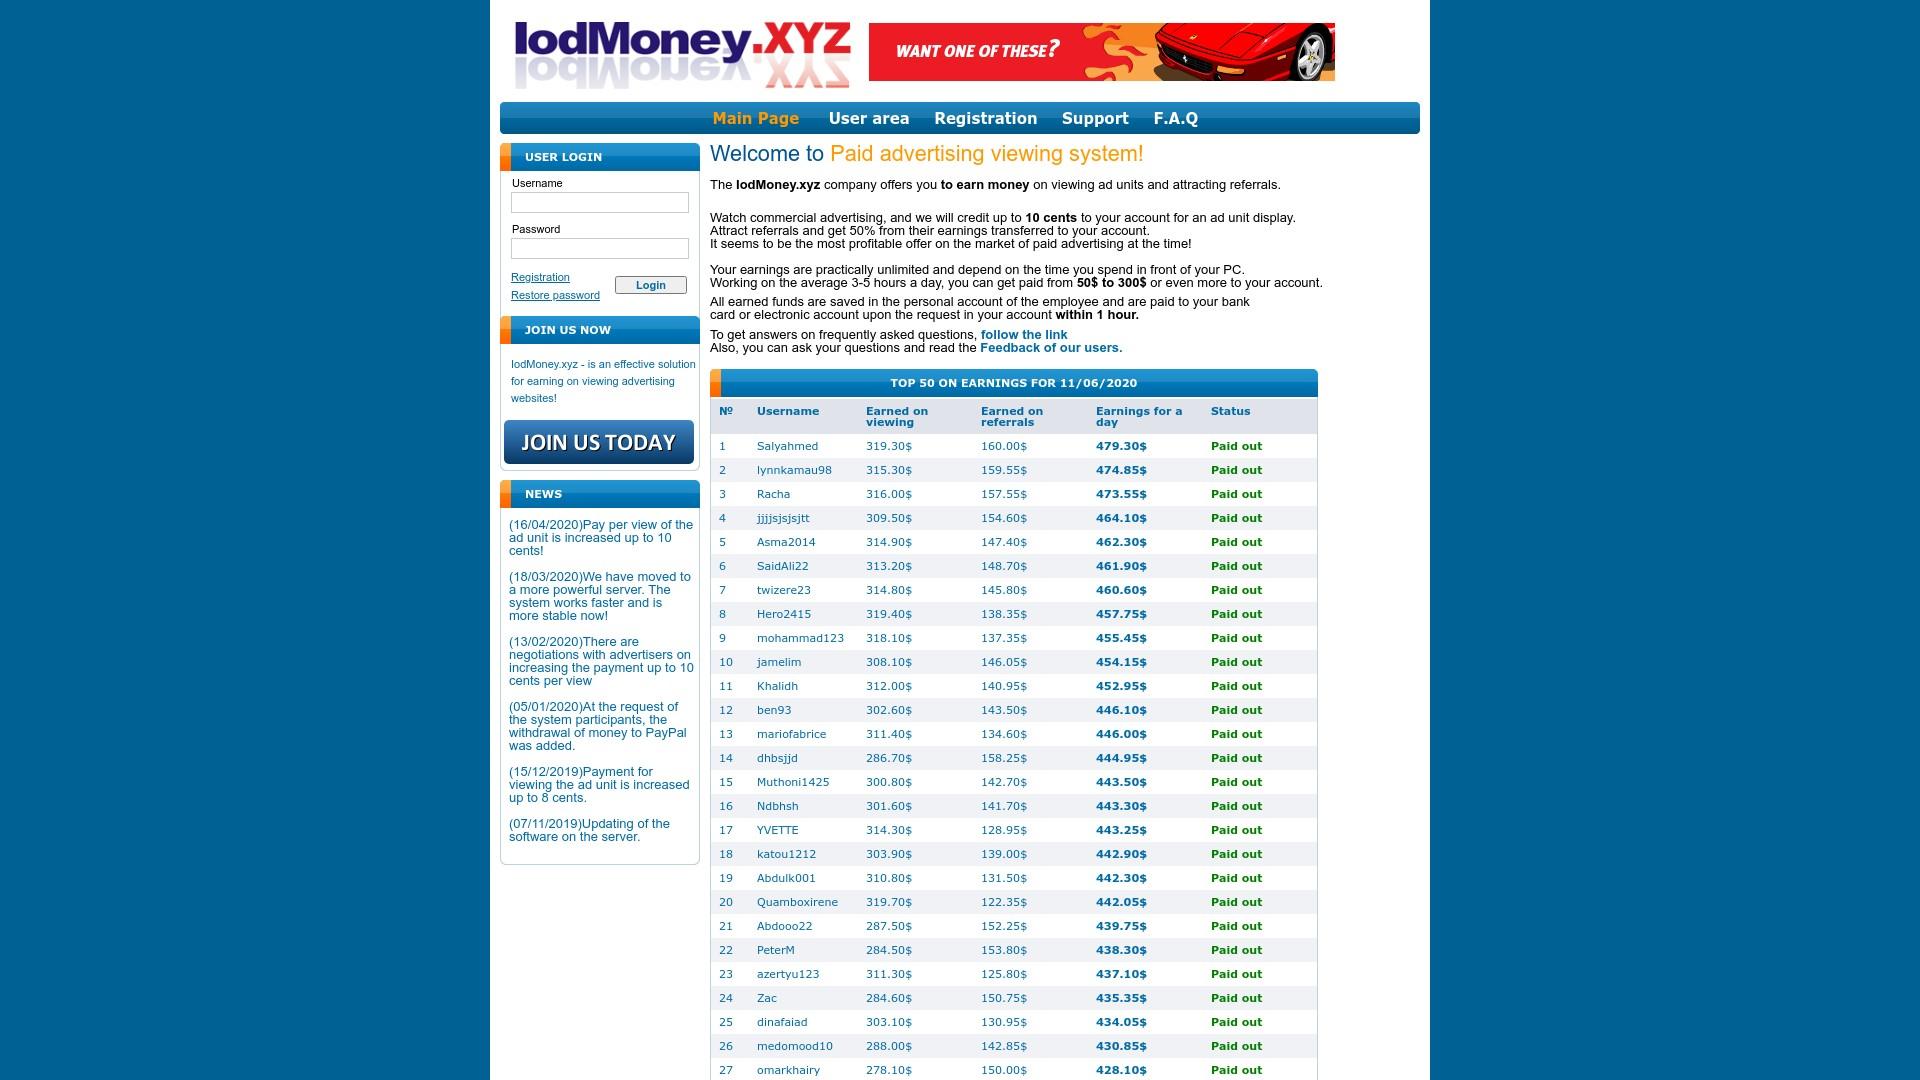 Iodmoney is a Fraudulent Work-From-Home Website